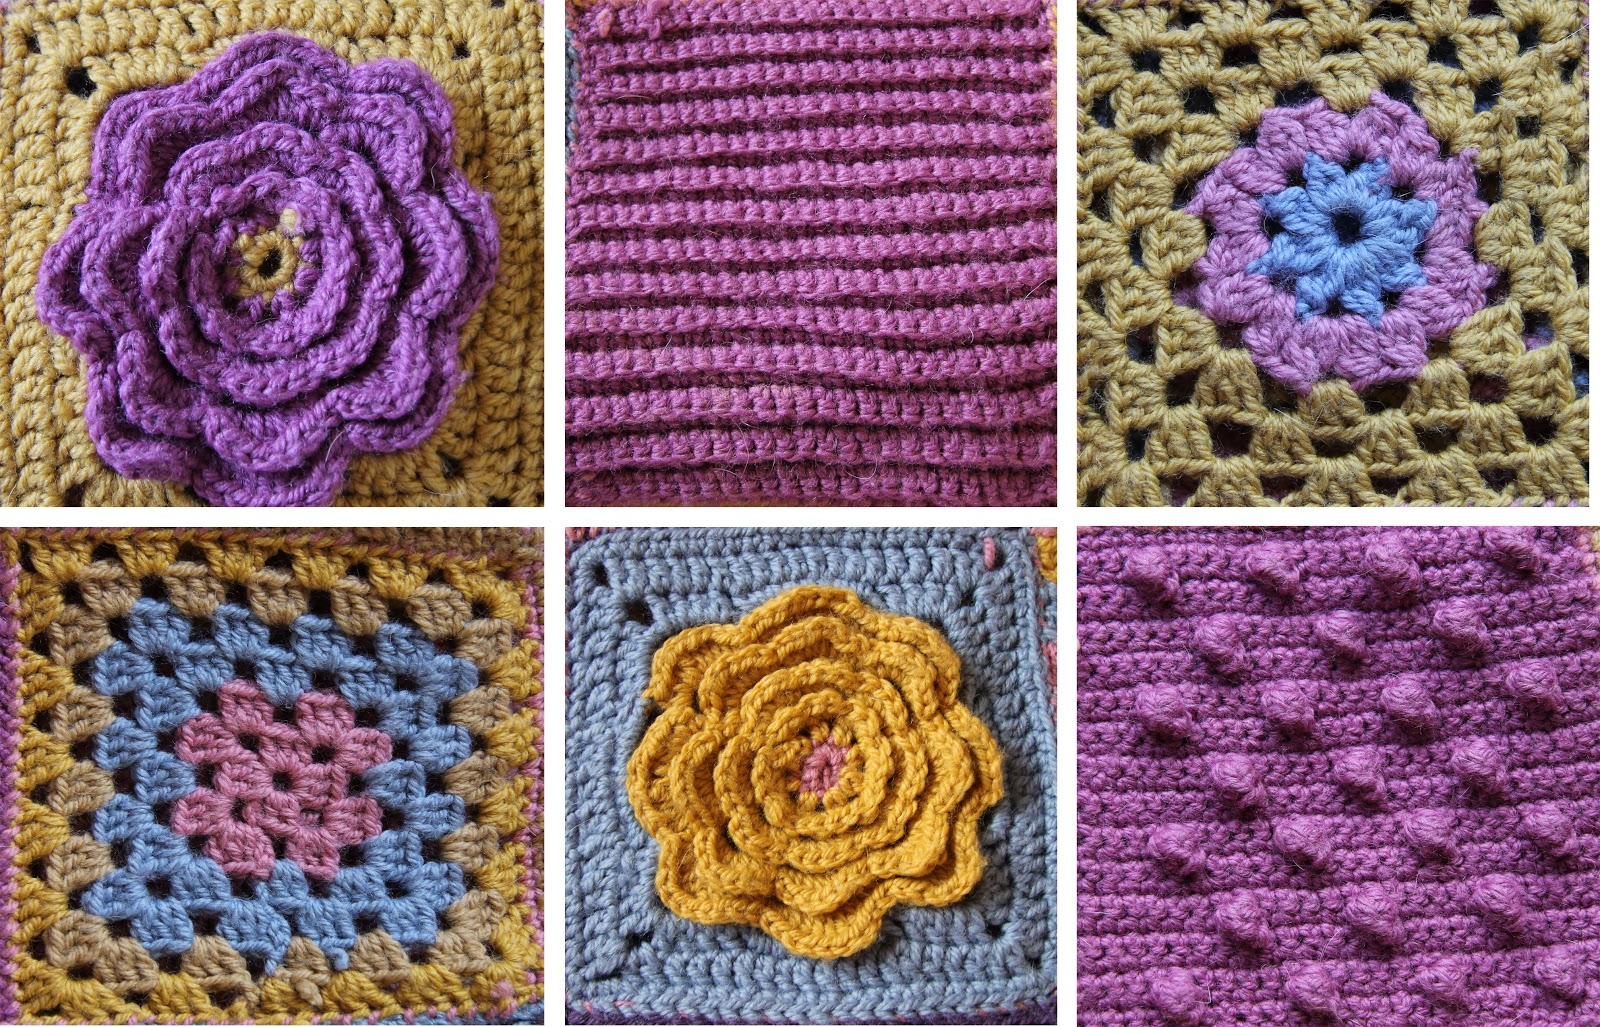 susimiu manta crochet popurri de muestras